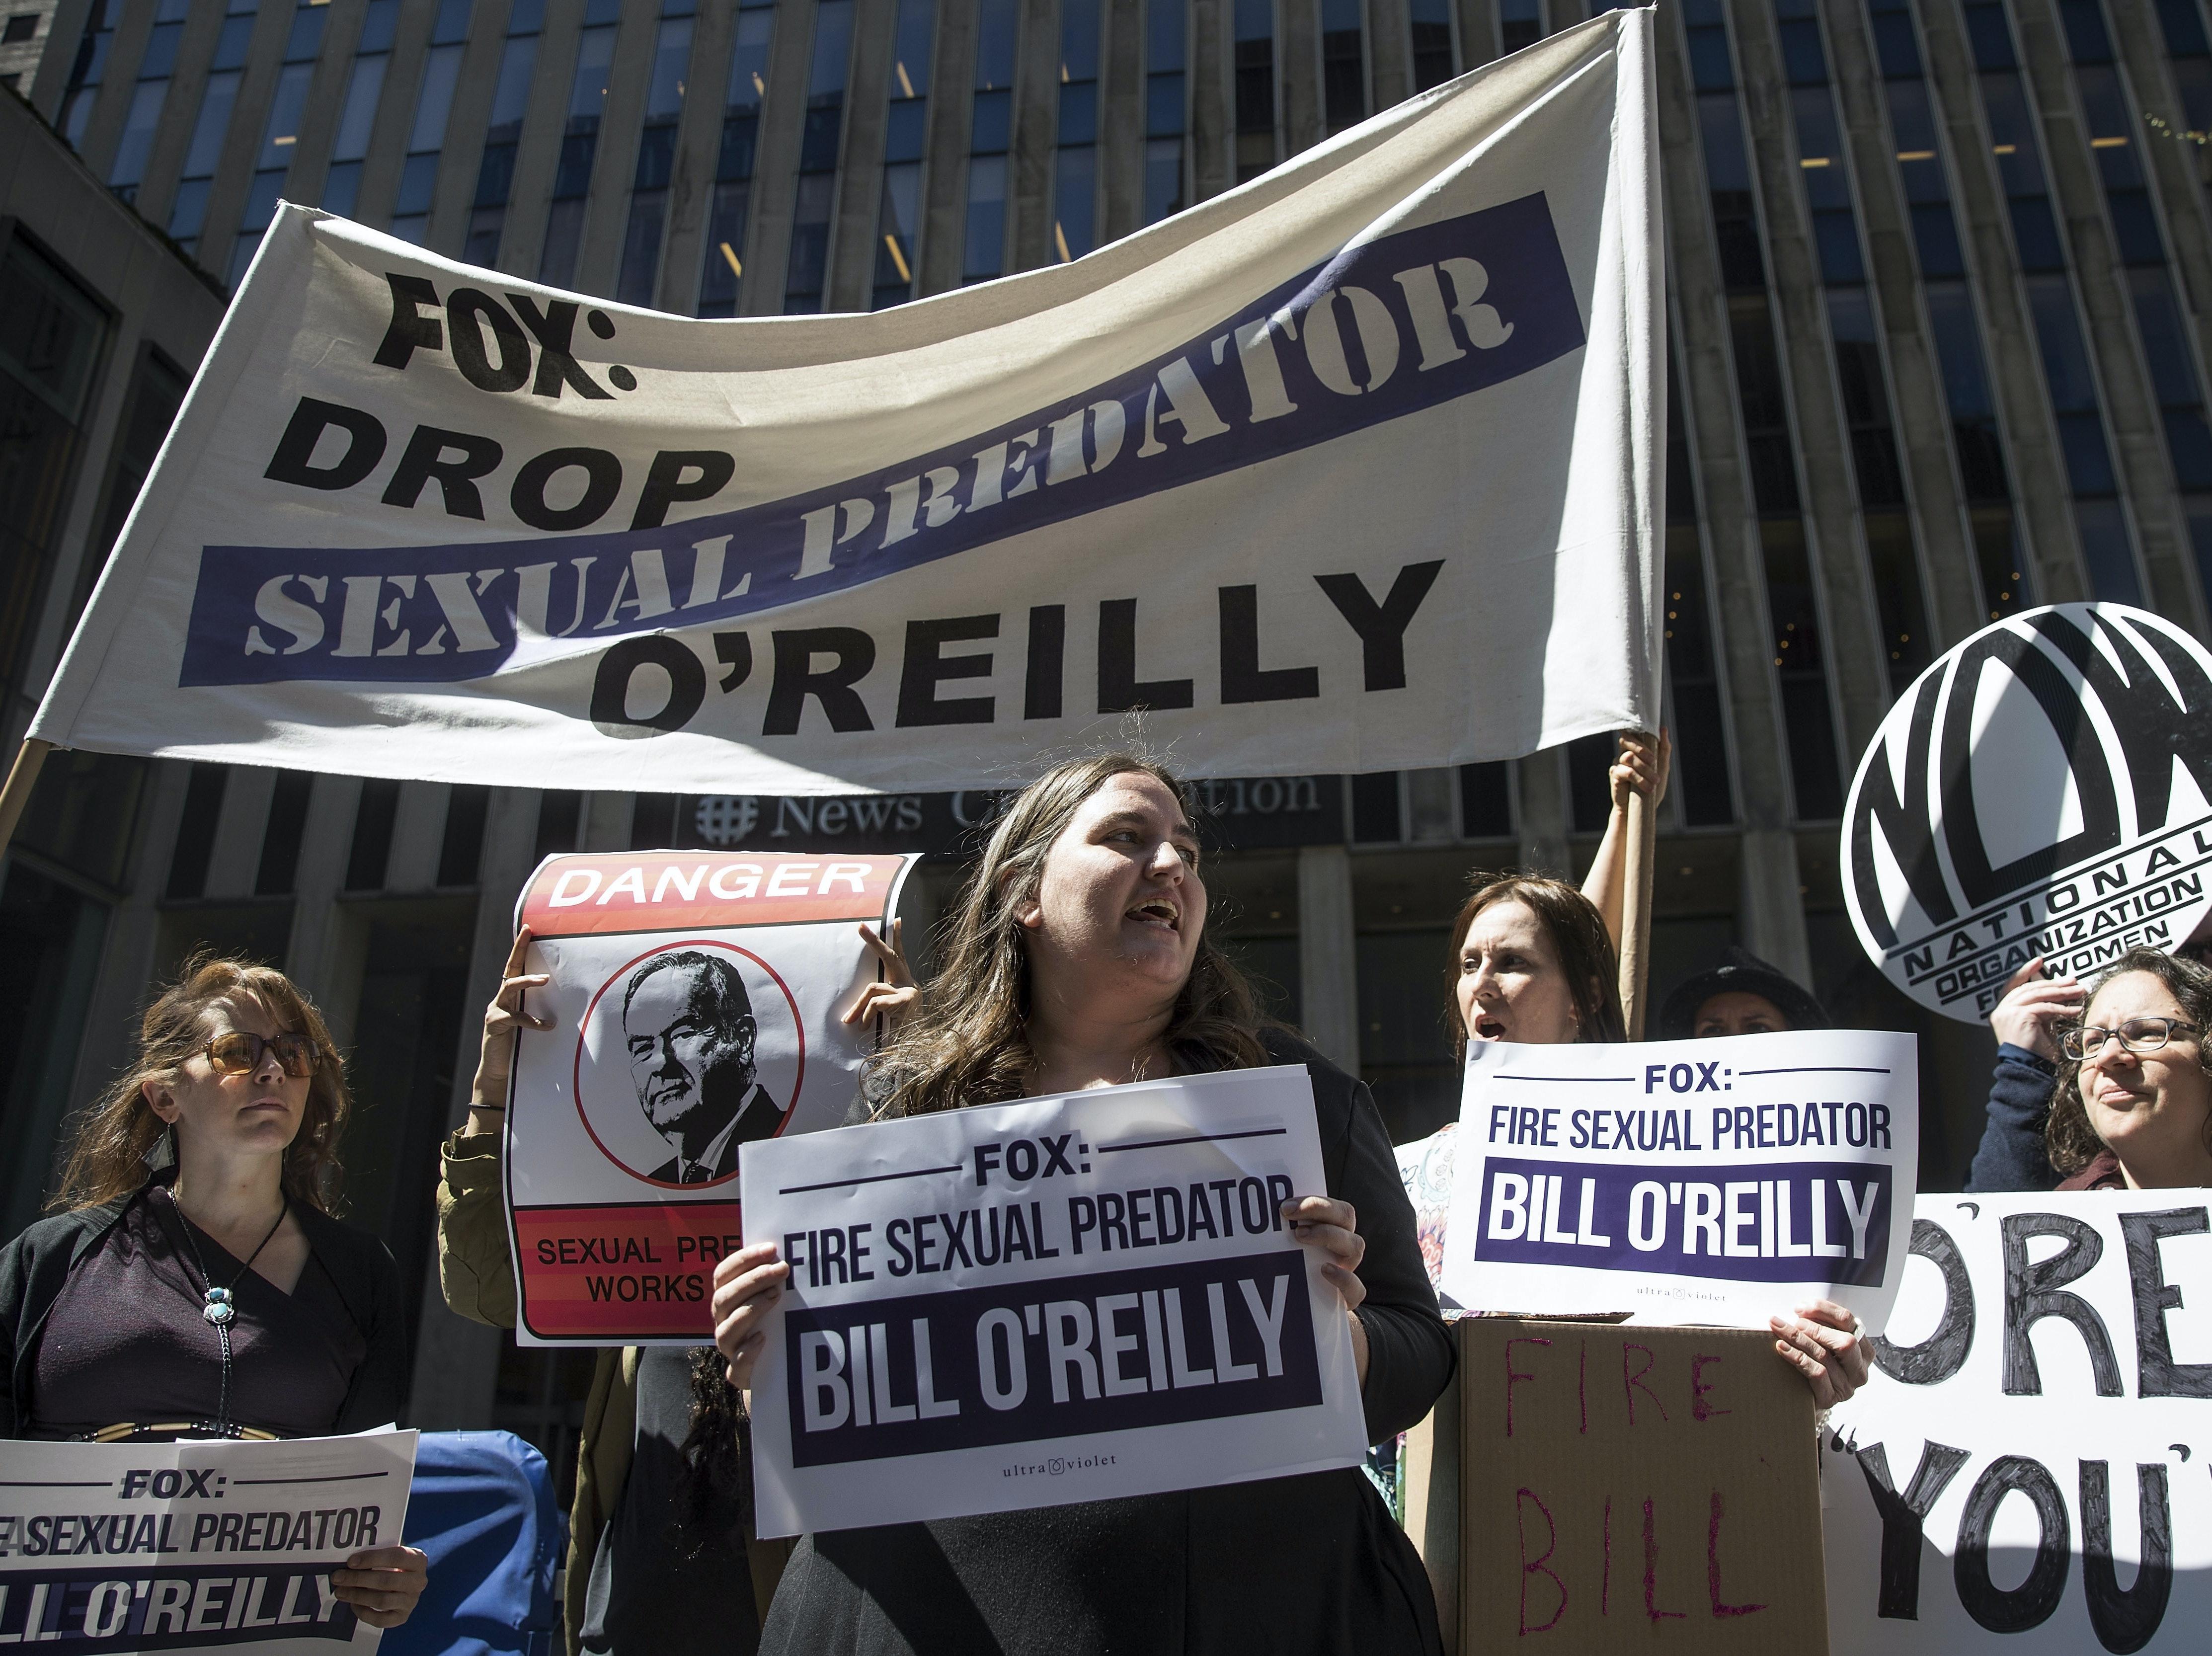 Bill O'Reilly's New Movie Still in Development at Fox's Nat Geo